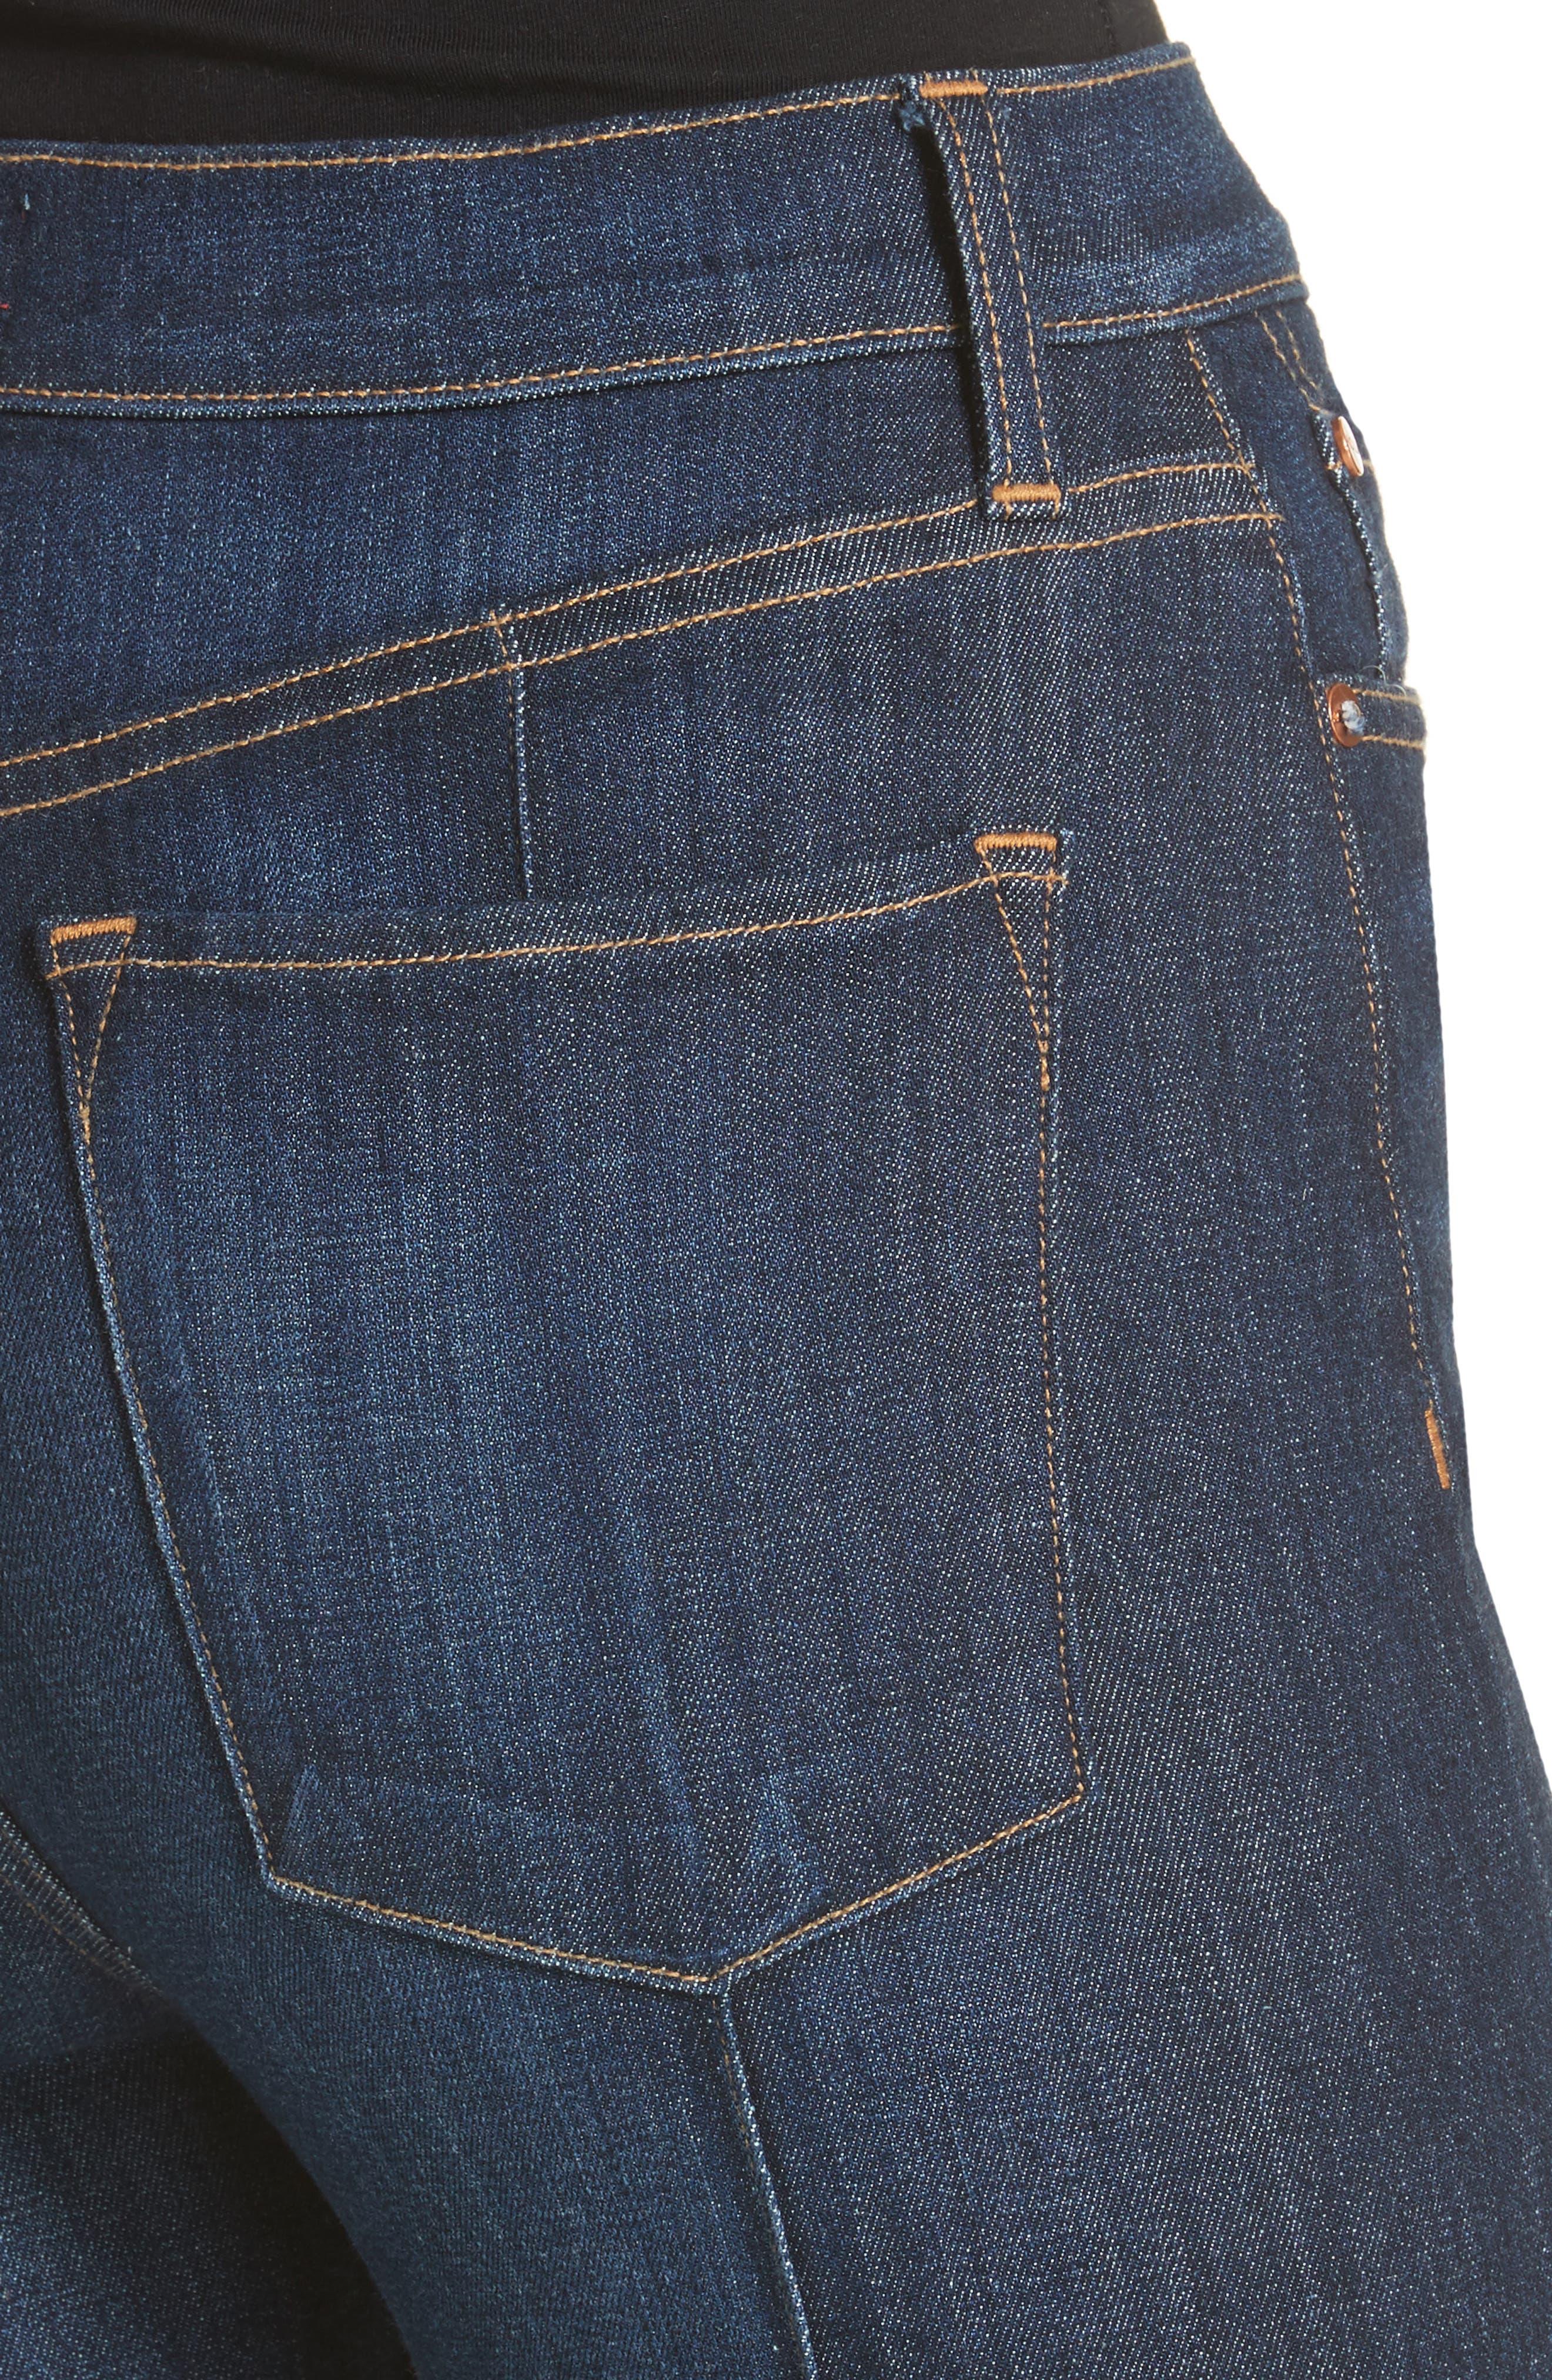 AO.LA Good High Waist Pintuck Skinny Jeans,                             Alternate thumbnail 4, color,                             Dream On